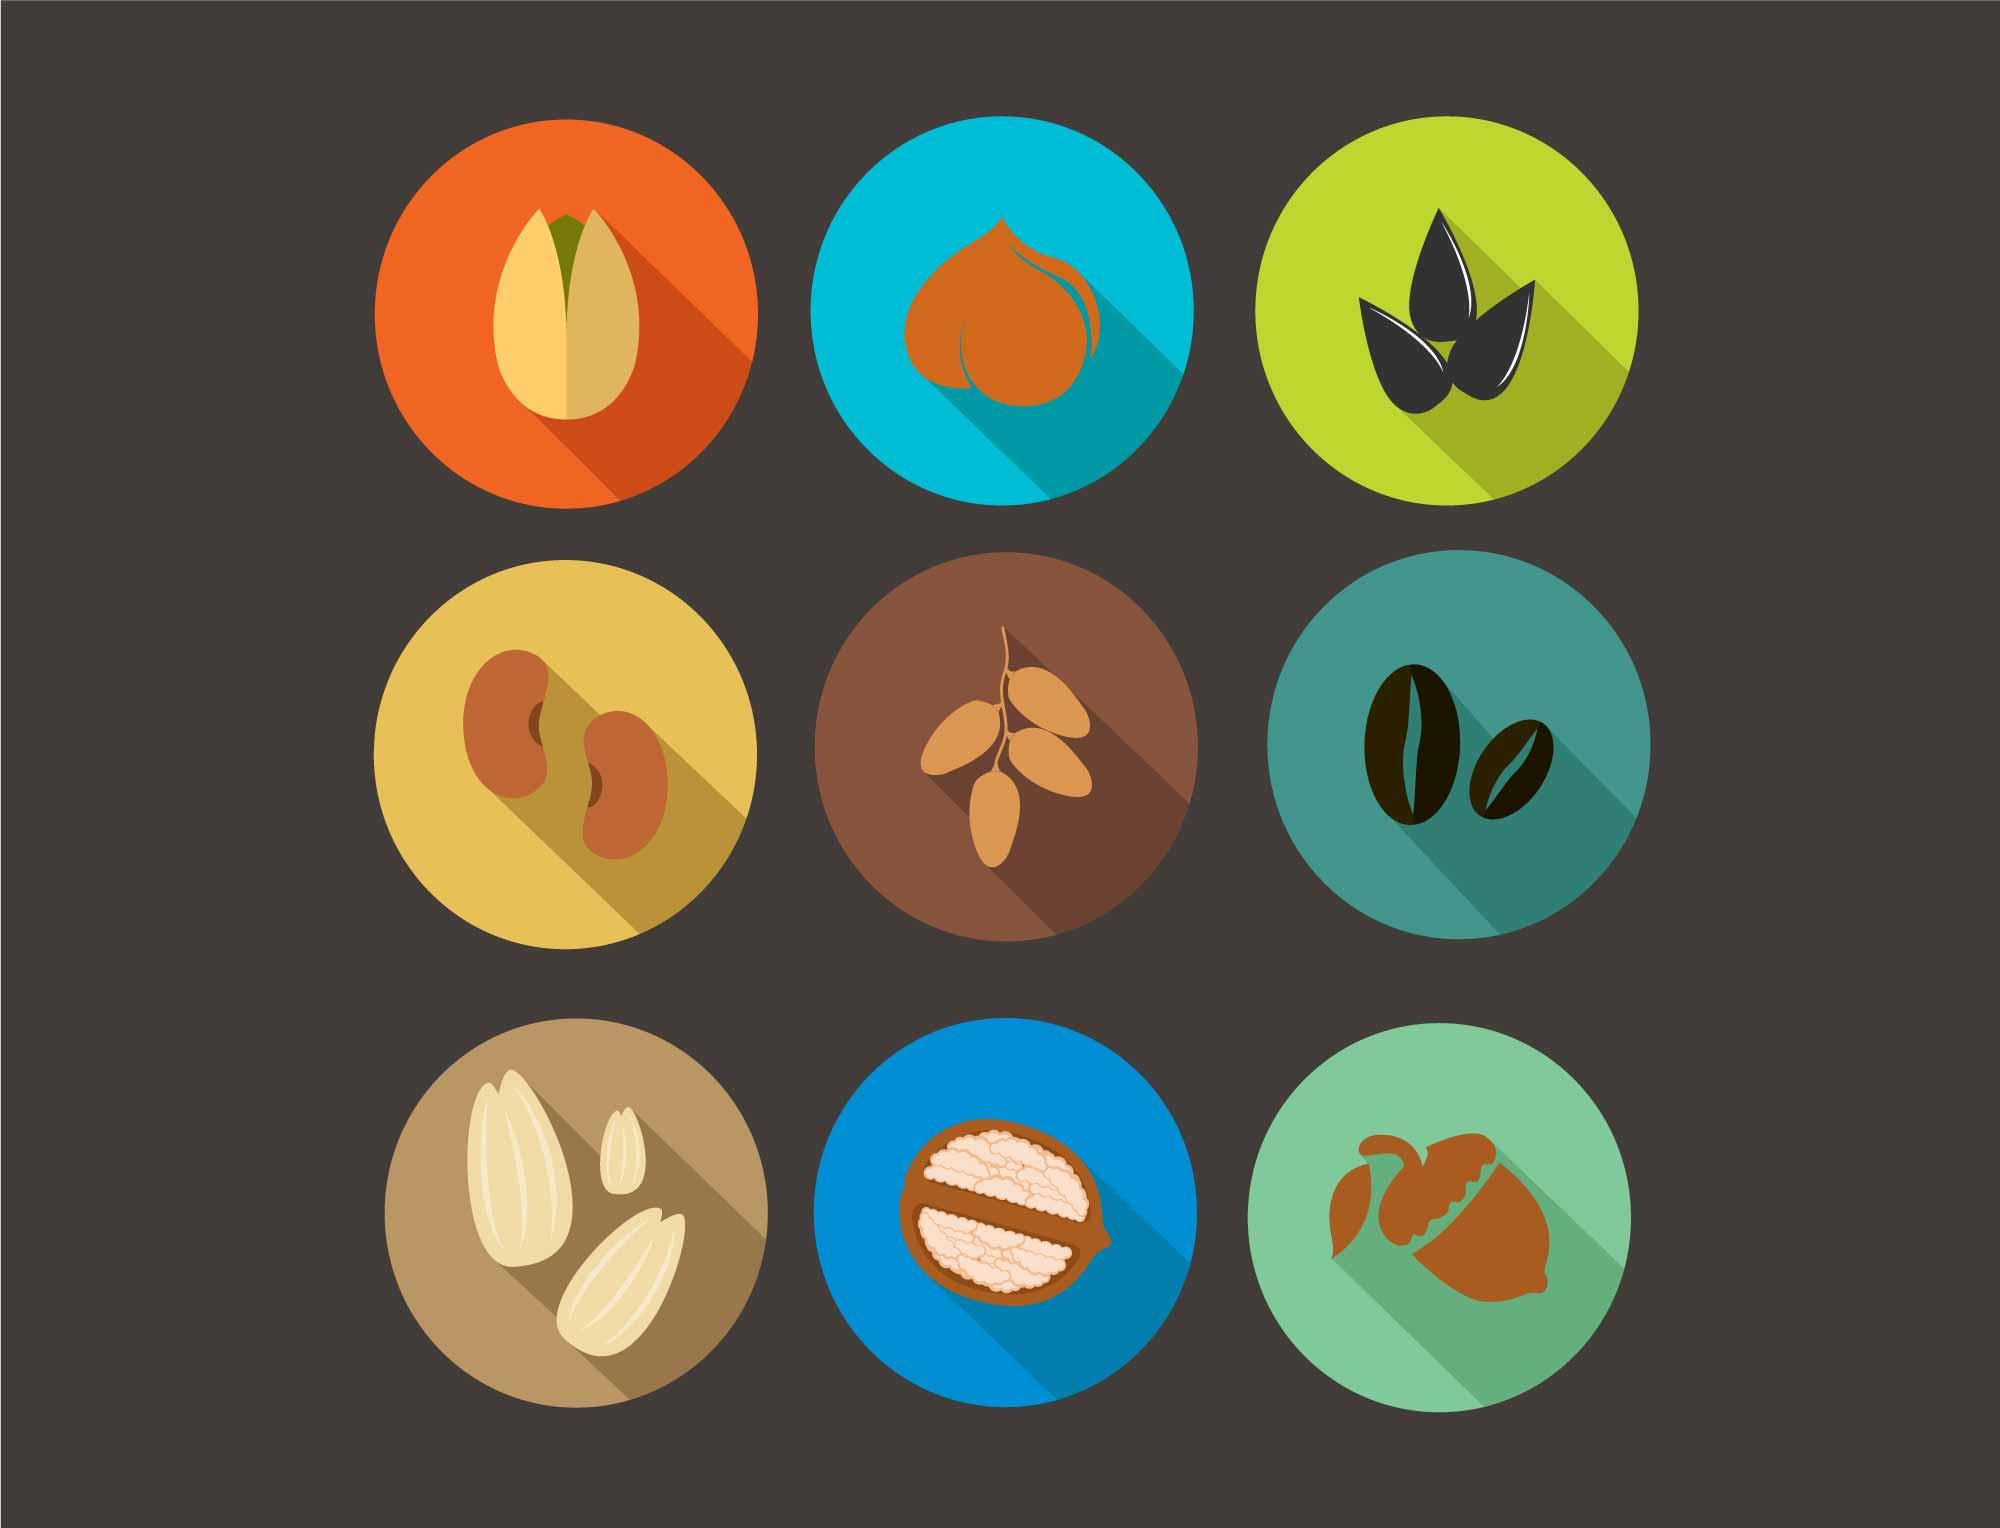 Бизнес на грецких орехах, выращивание грецкого ореха как бизнес, грецкий орех бизнес план